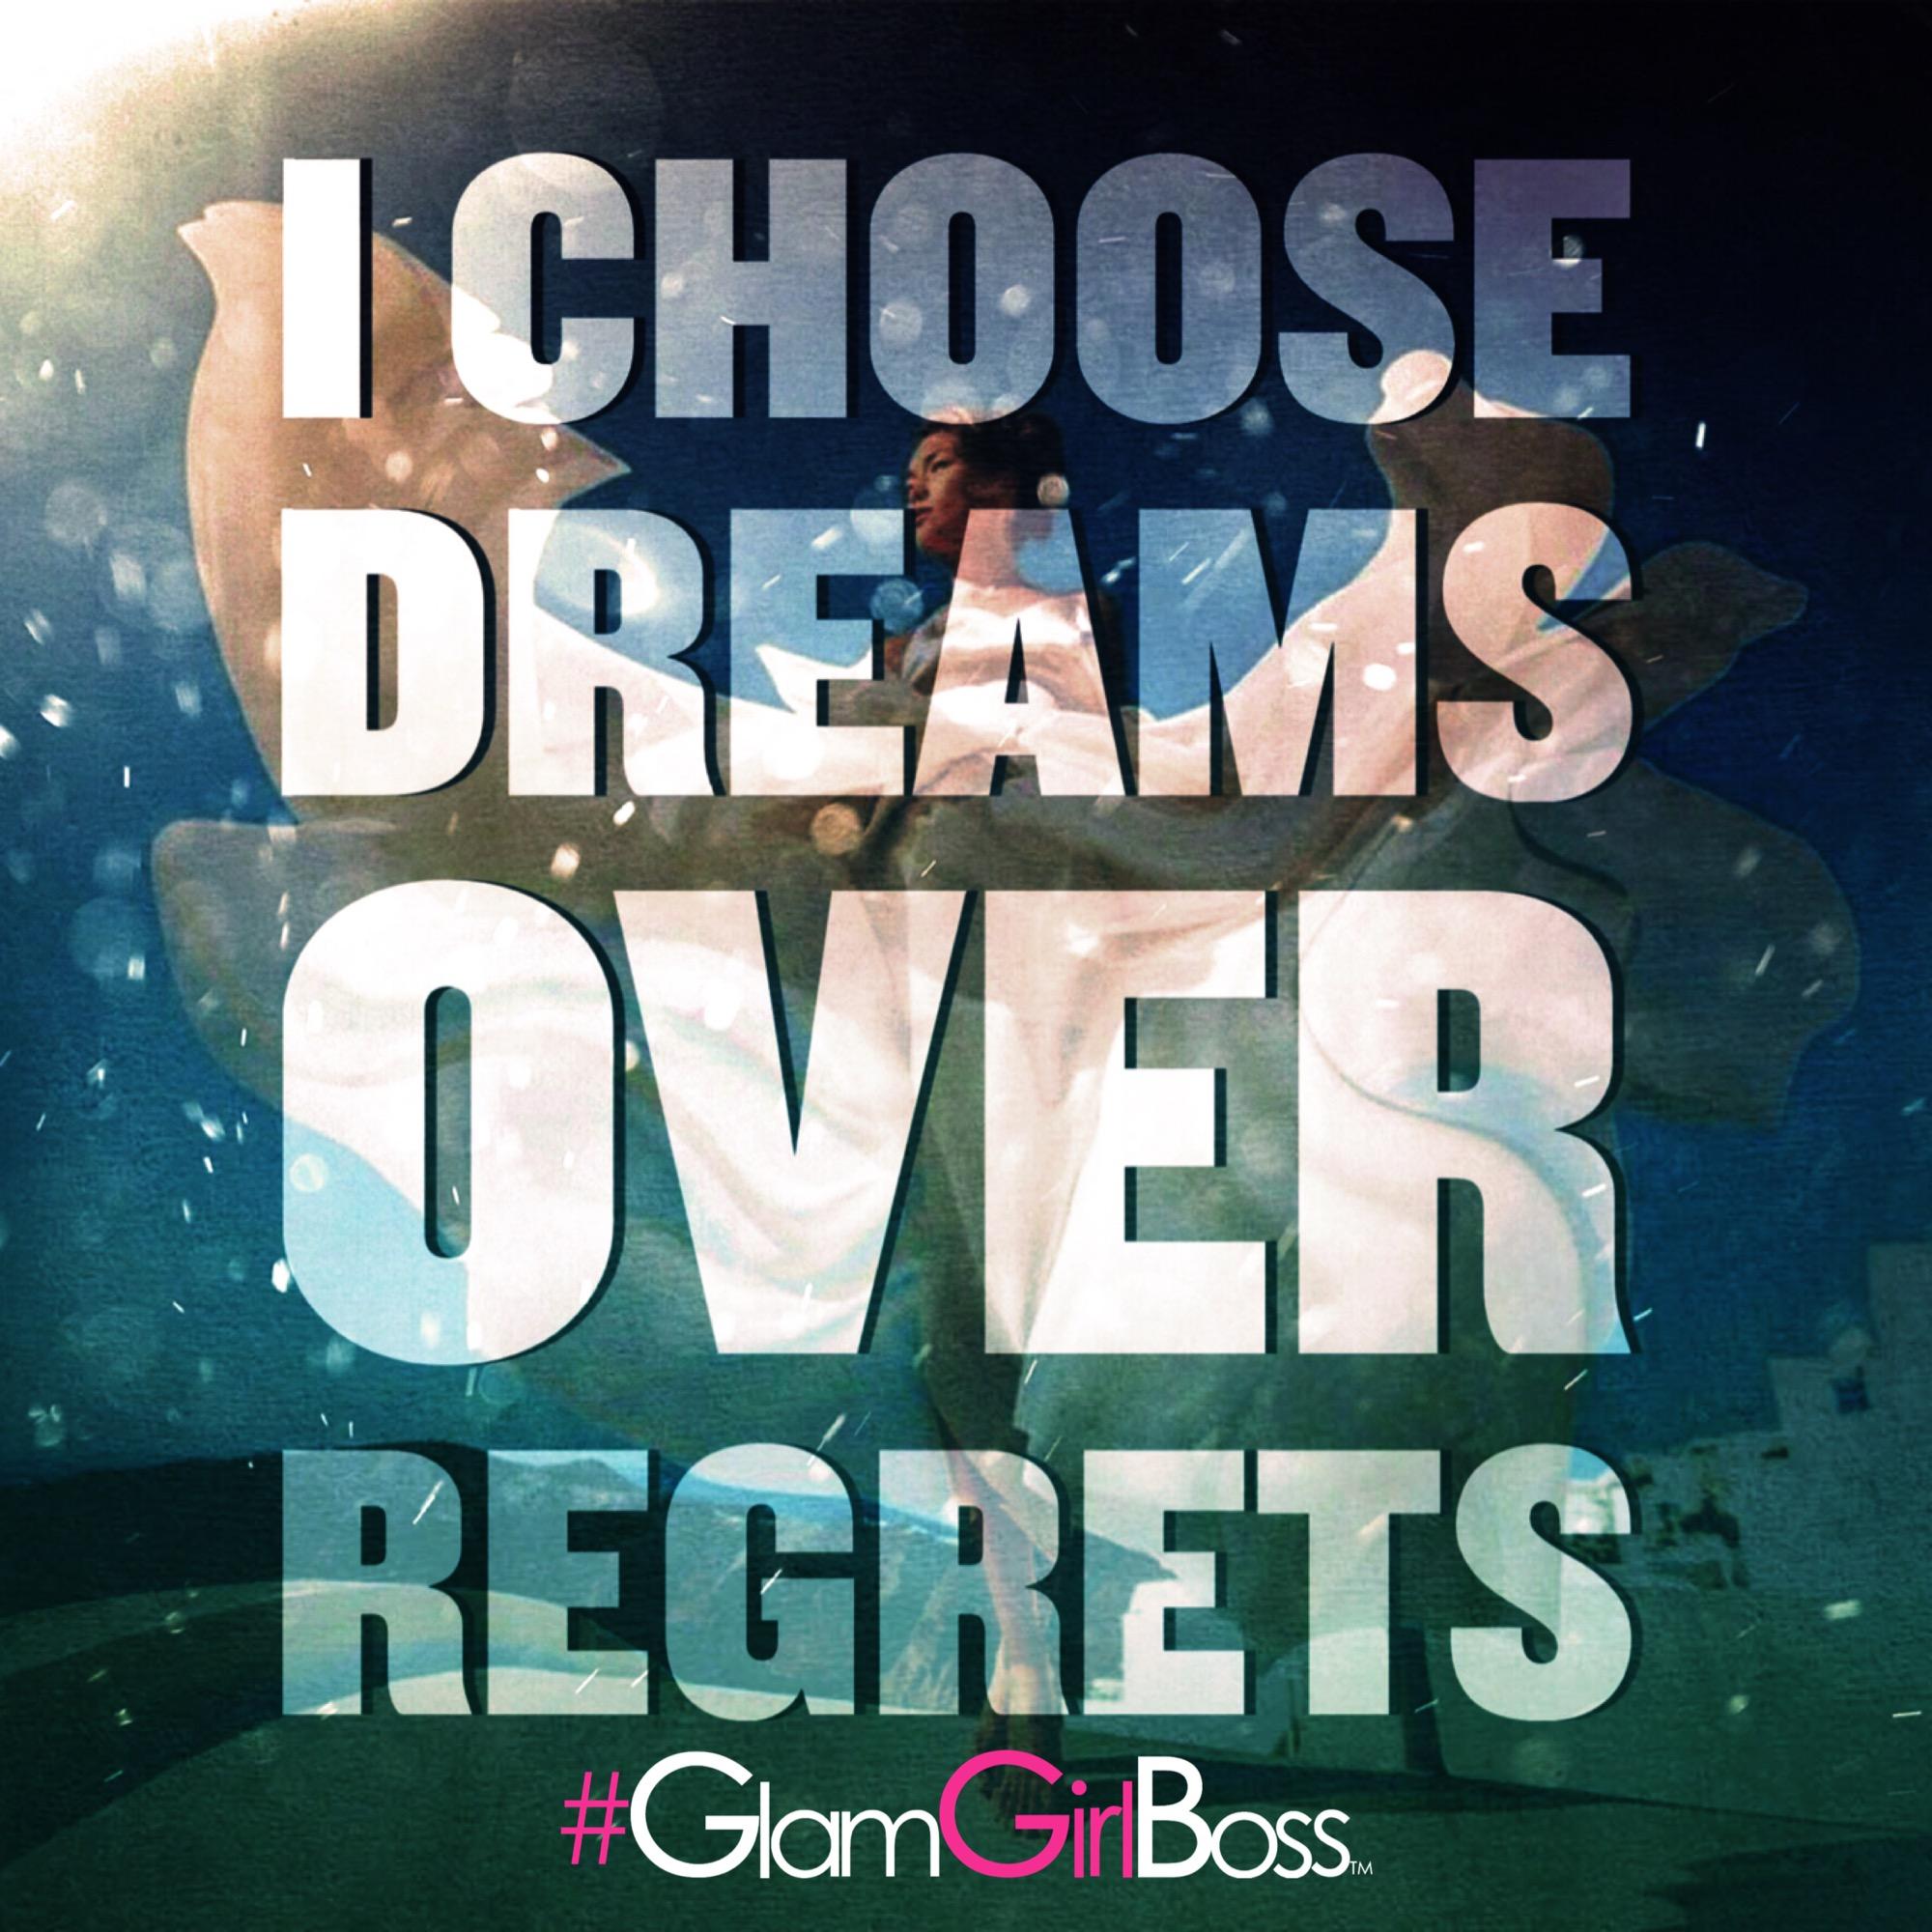 Choose dreams over regrets.